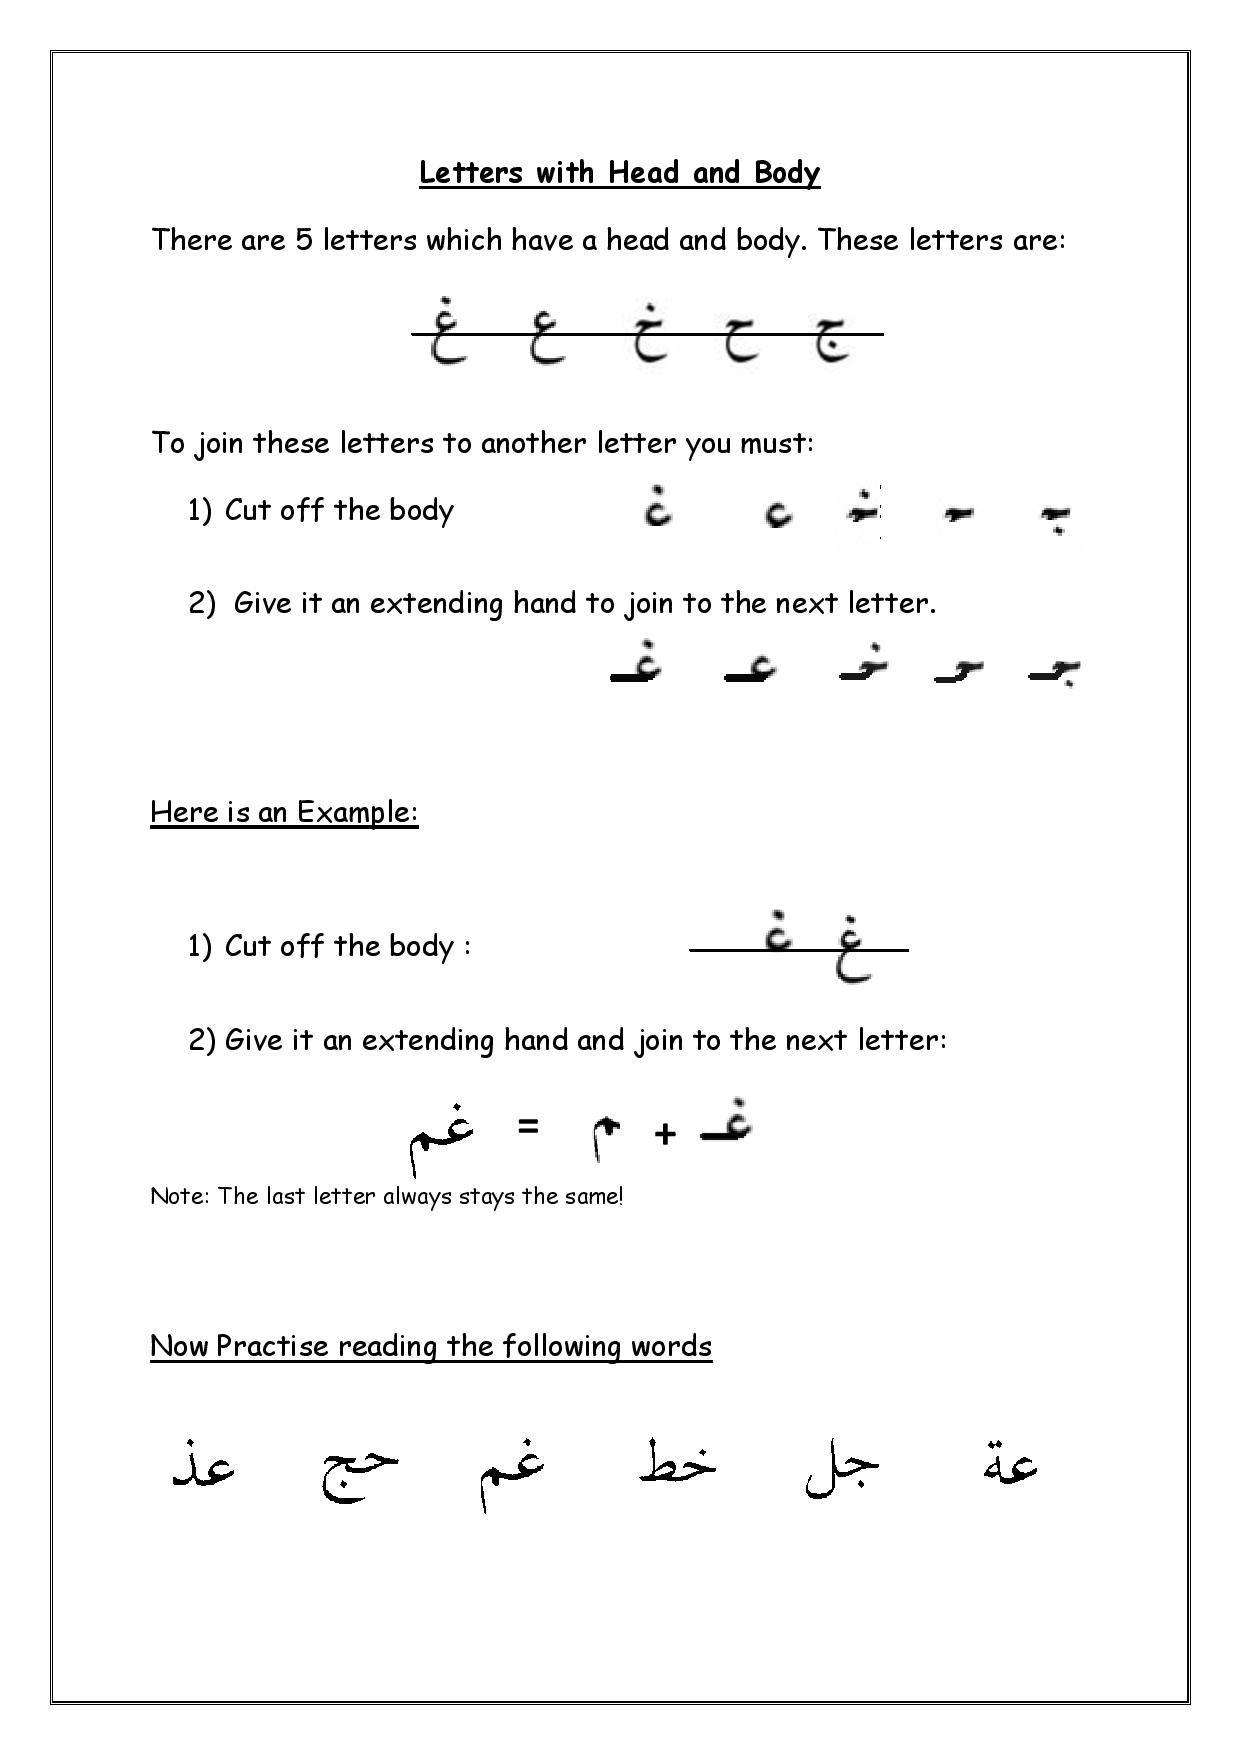 Arabic Handwriting Rules Printable Free Pdf At Www Arabicadventures Com Learn Arabic Alphabet Learning Arabic Arabic Handwriting